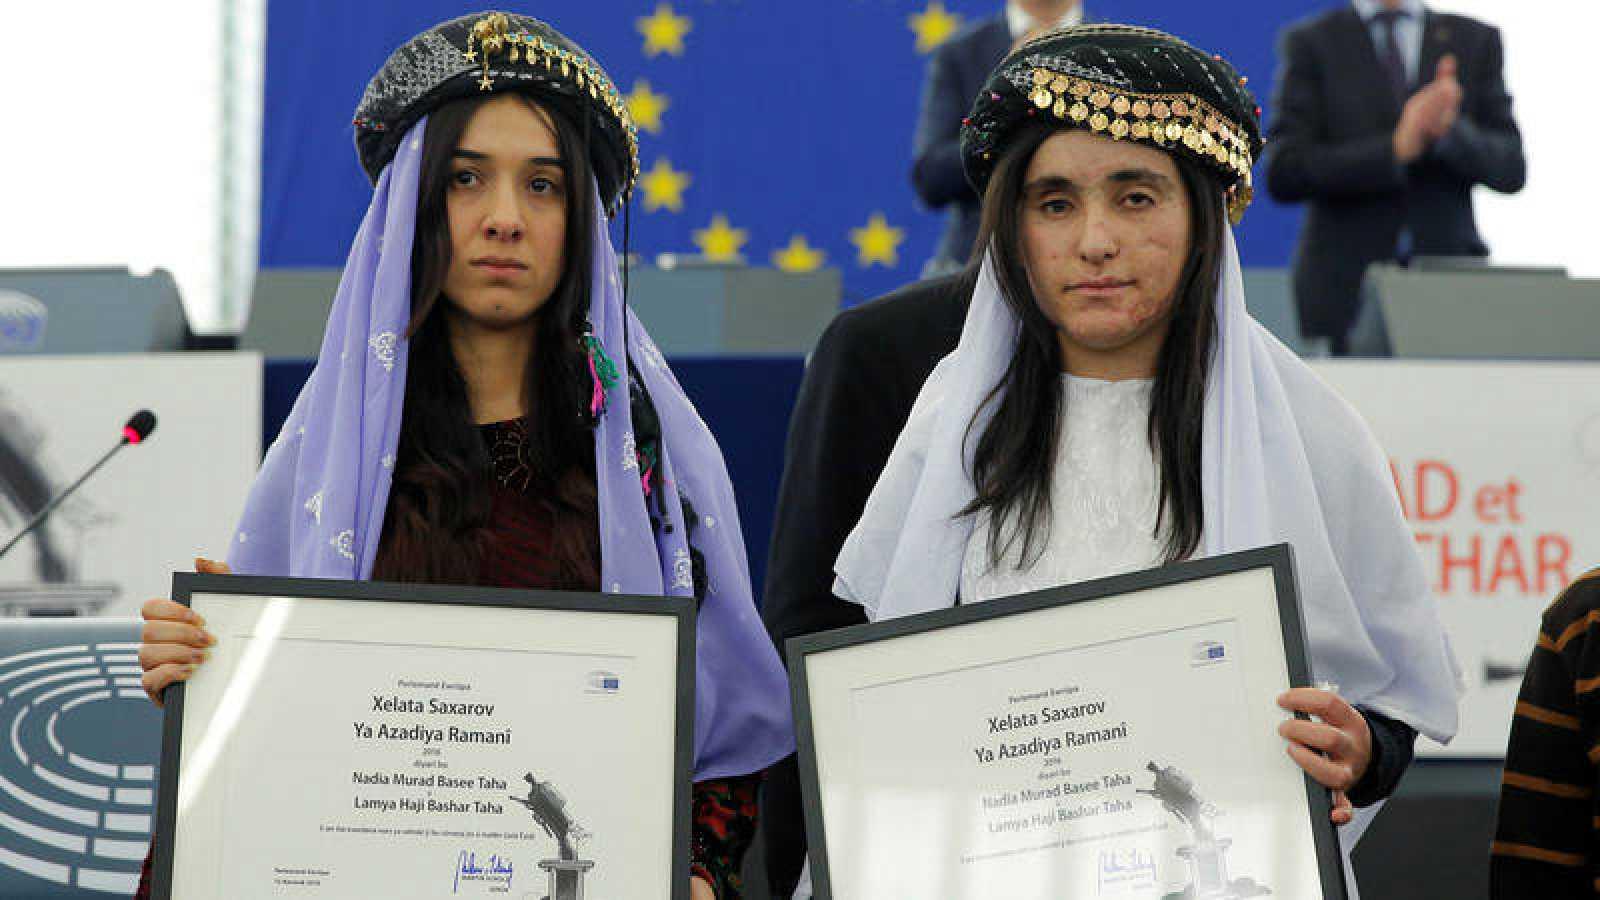 Las refugiadas yazidíes Nadia Murad y Lamiya Aji Bashar, ganadoras del Premio Sajarov 2016